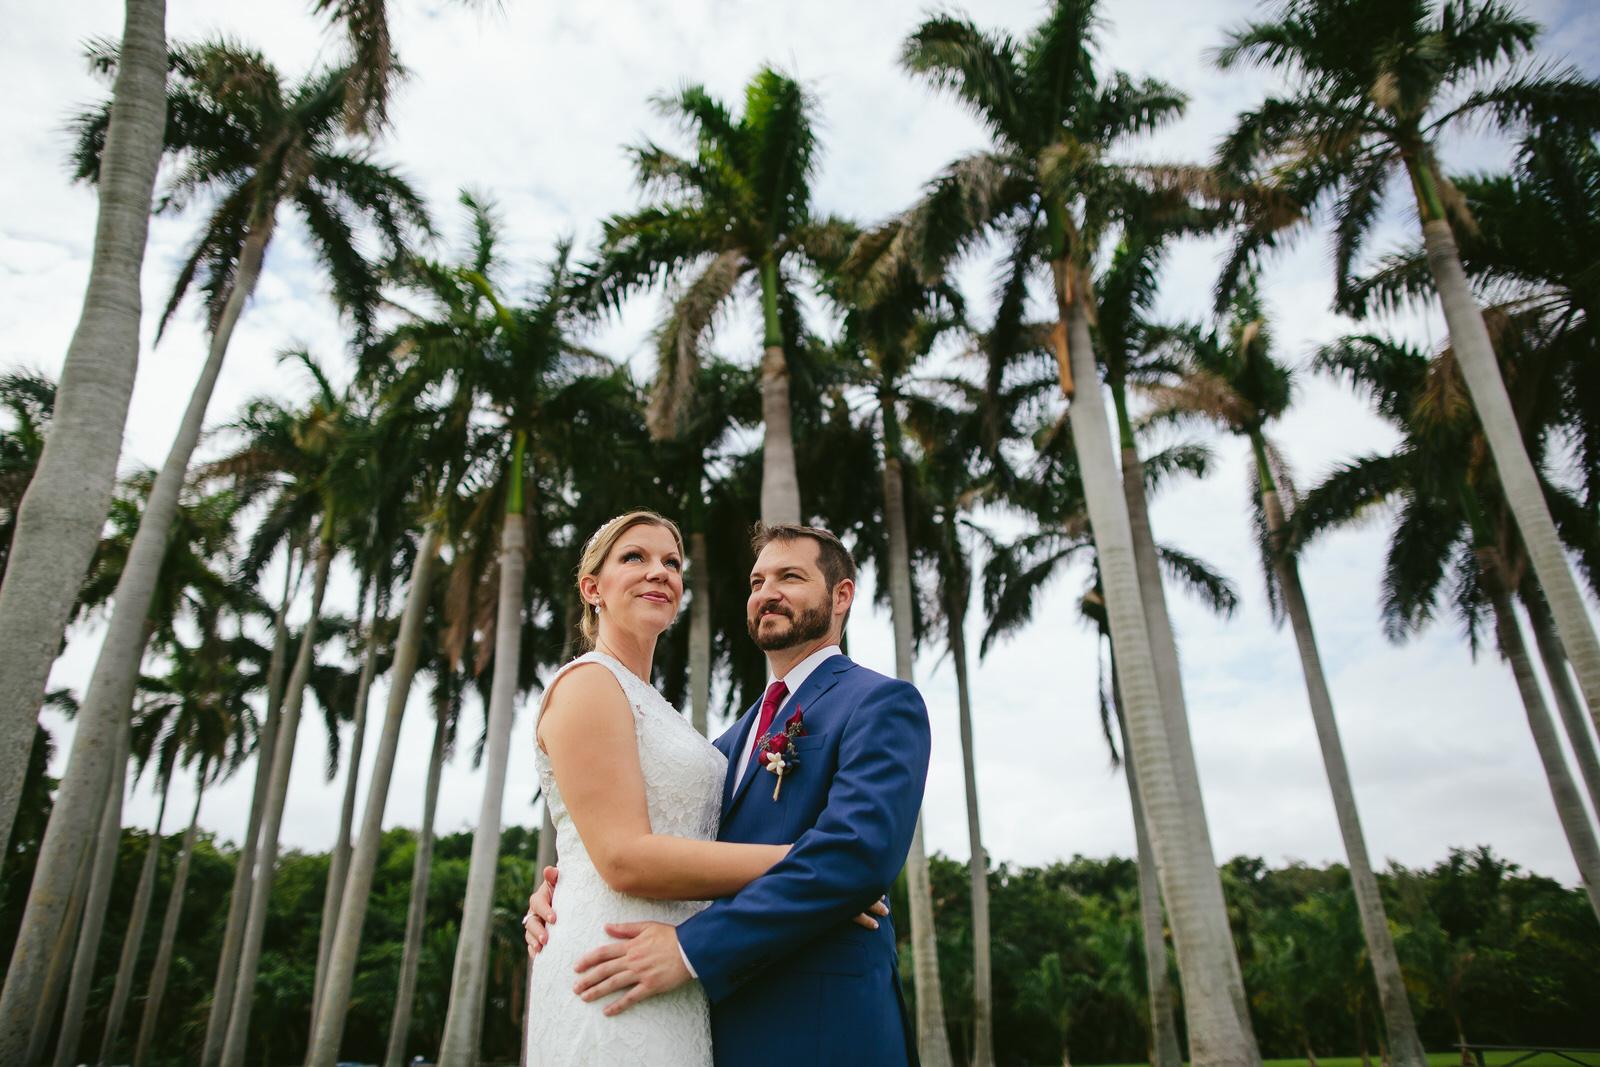 bride_groom_deering_estate_wedding_tiny_house_photo_miami_photographer-42.jpg